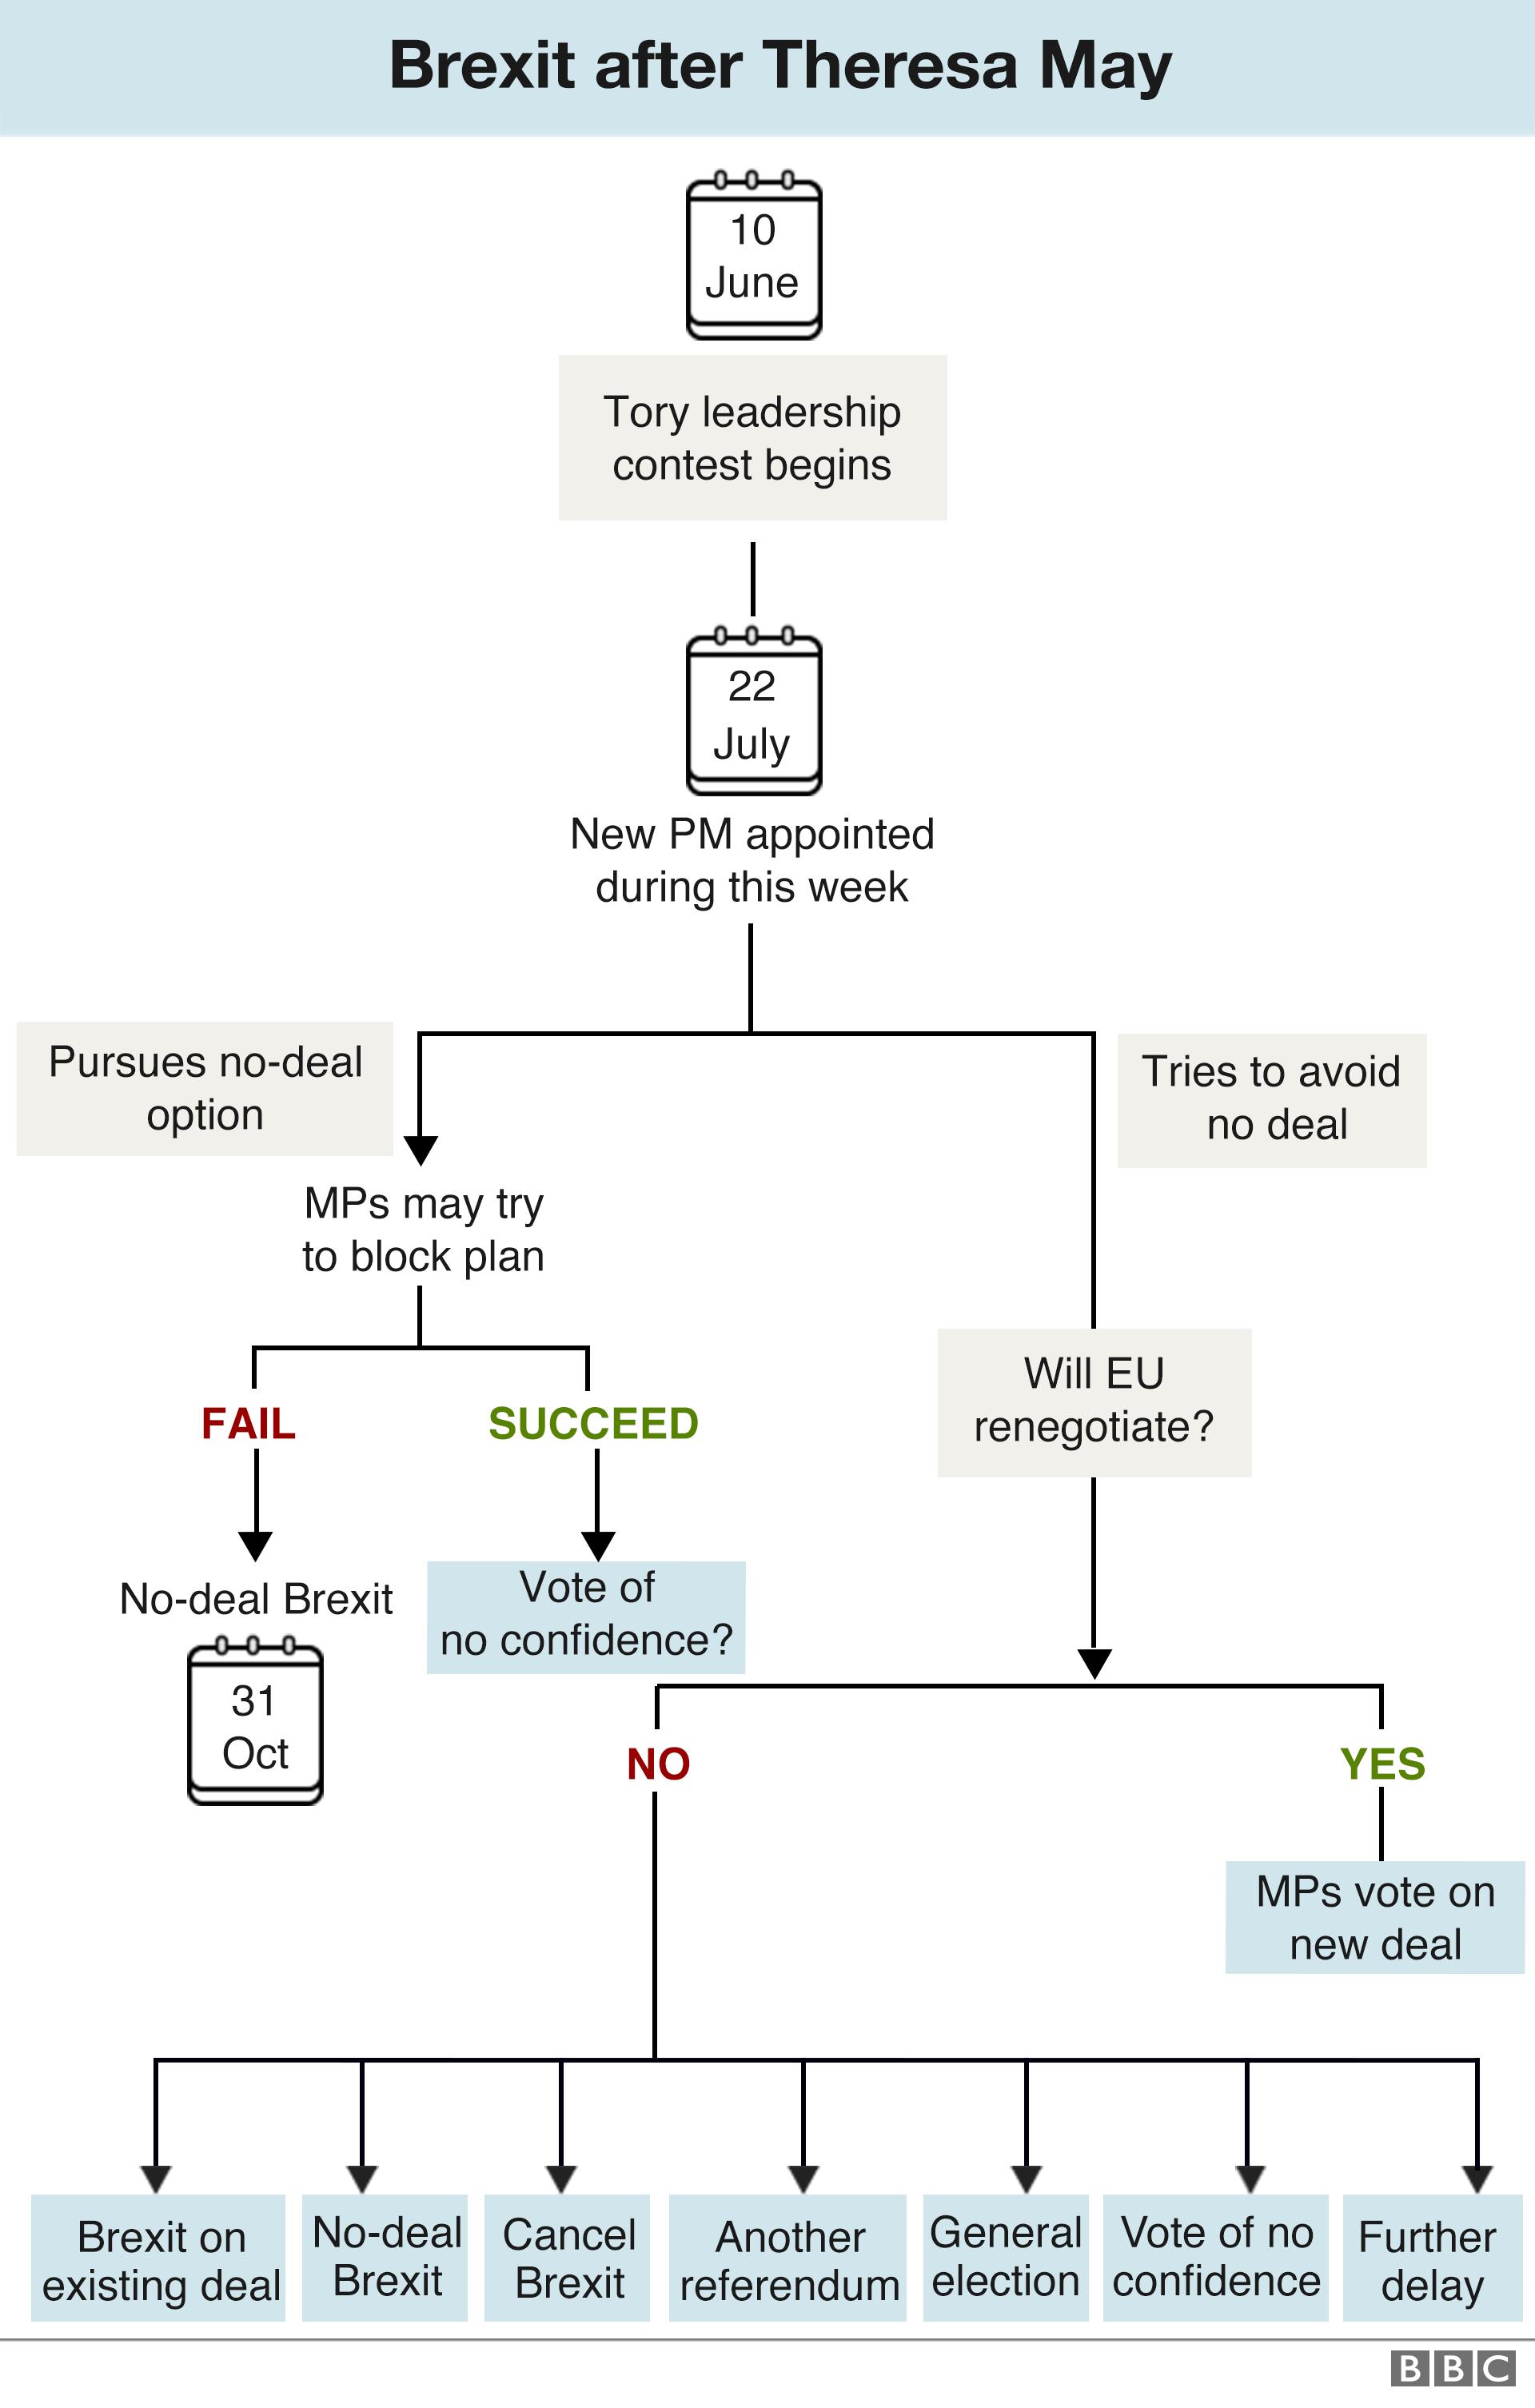 _107319974_brexit_flowchart_next_steps_10june_v2_-3x640-nc